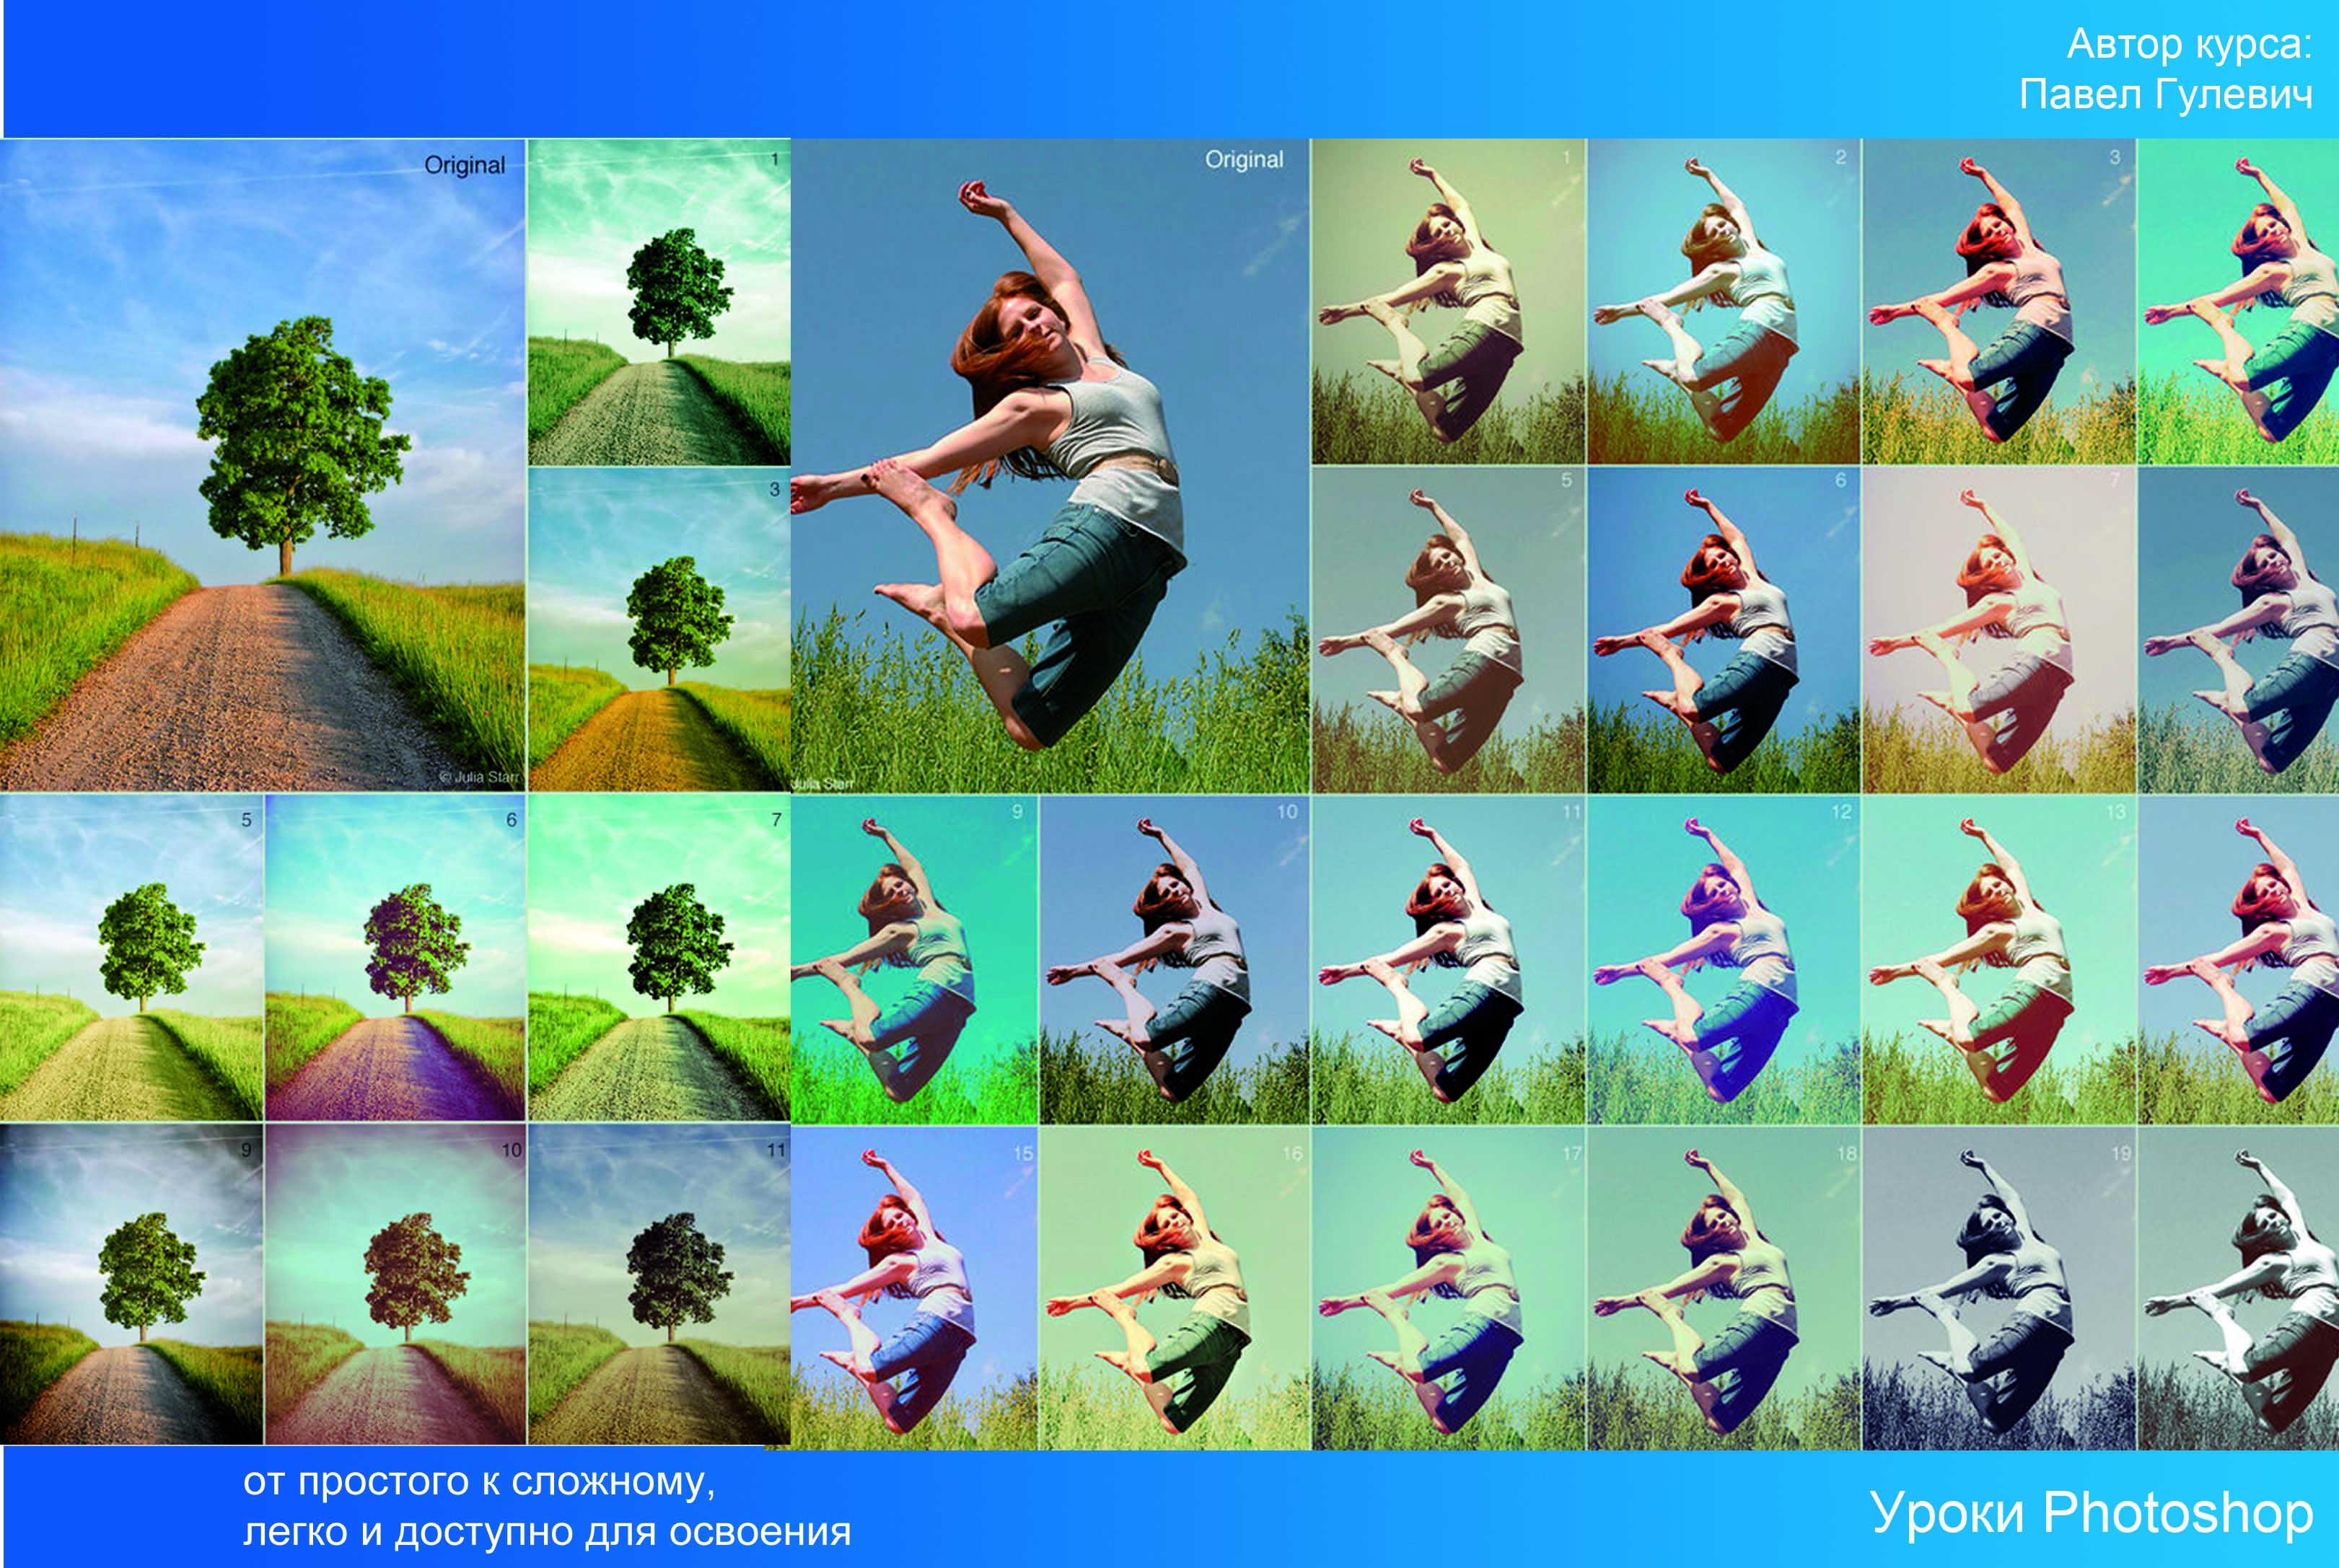 Создание дизайна DVD релиза (обложка, накатка, меню и т.п.) фото f_4d8cf4457e81f.jpg